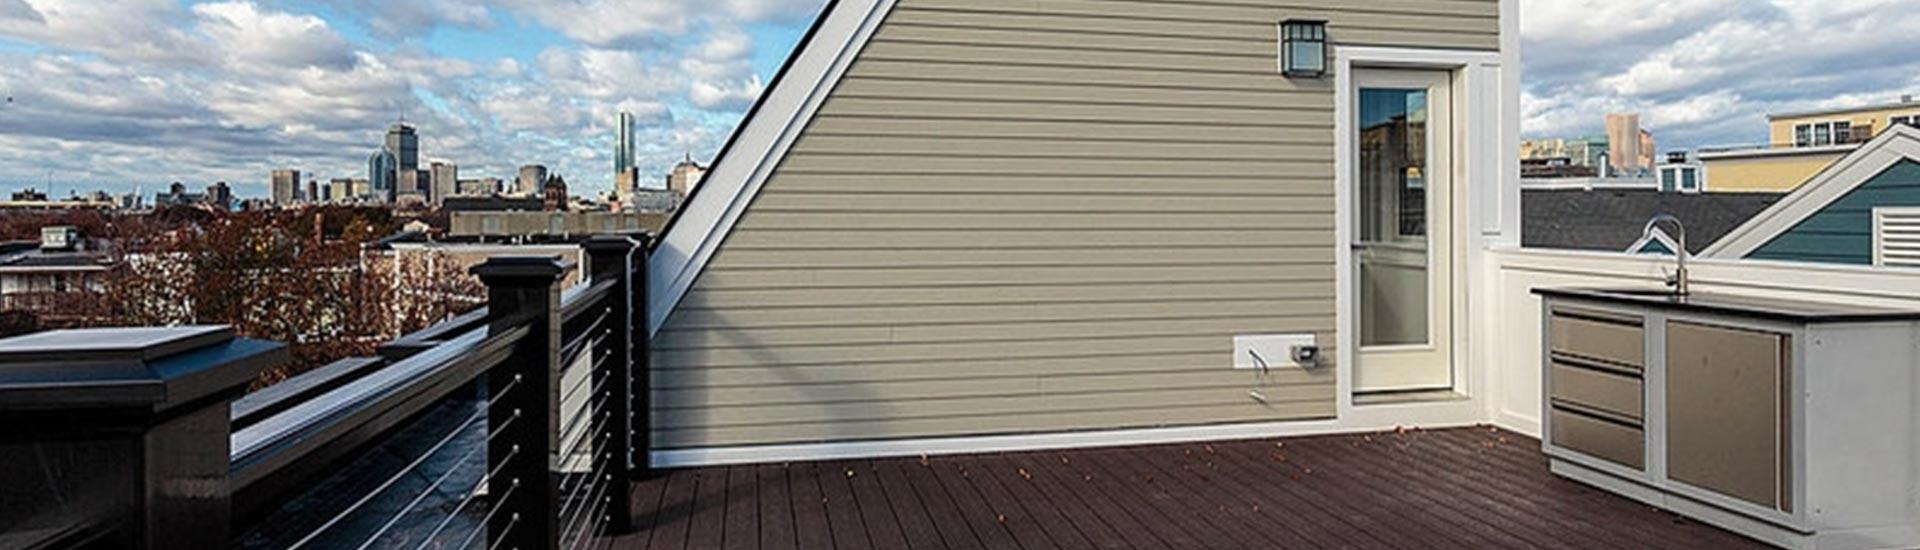 roof-deck-4